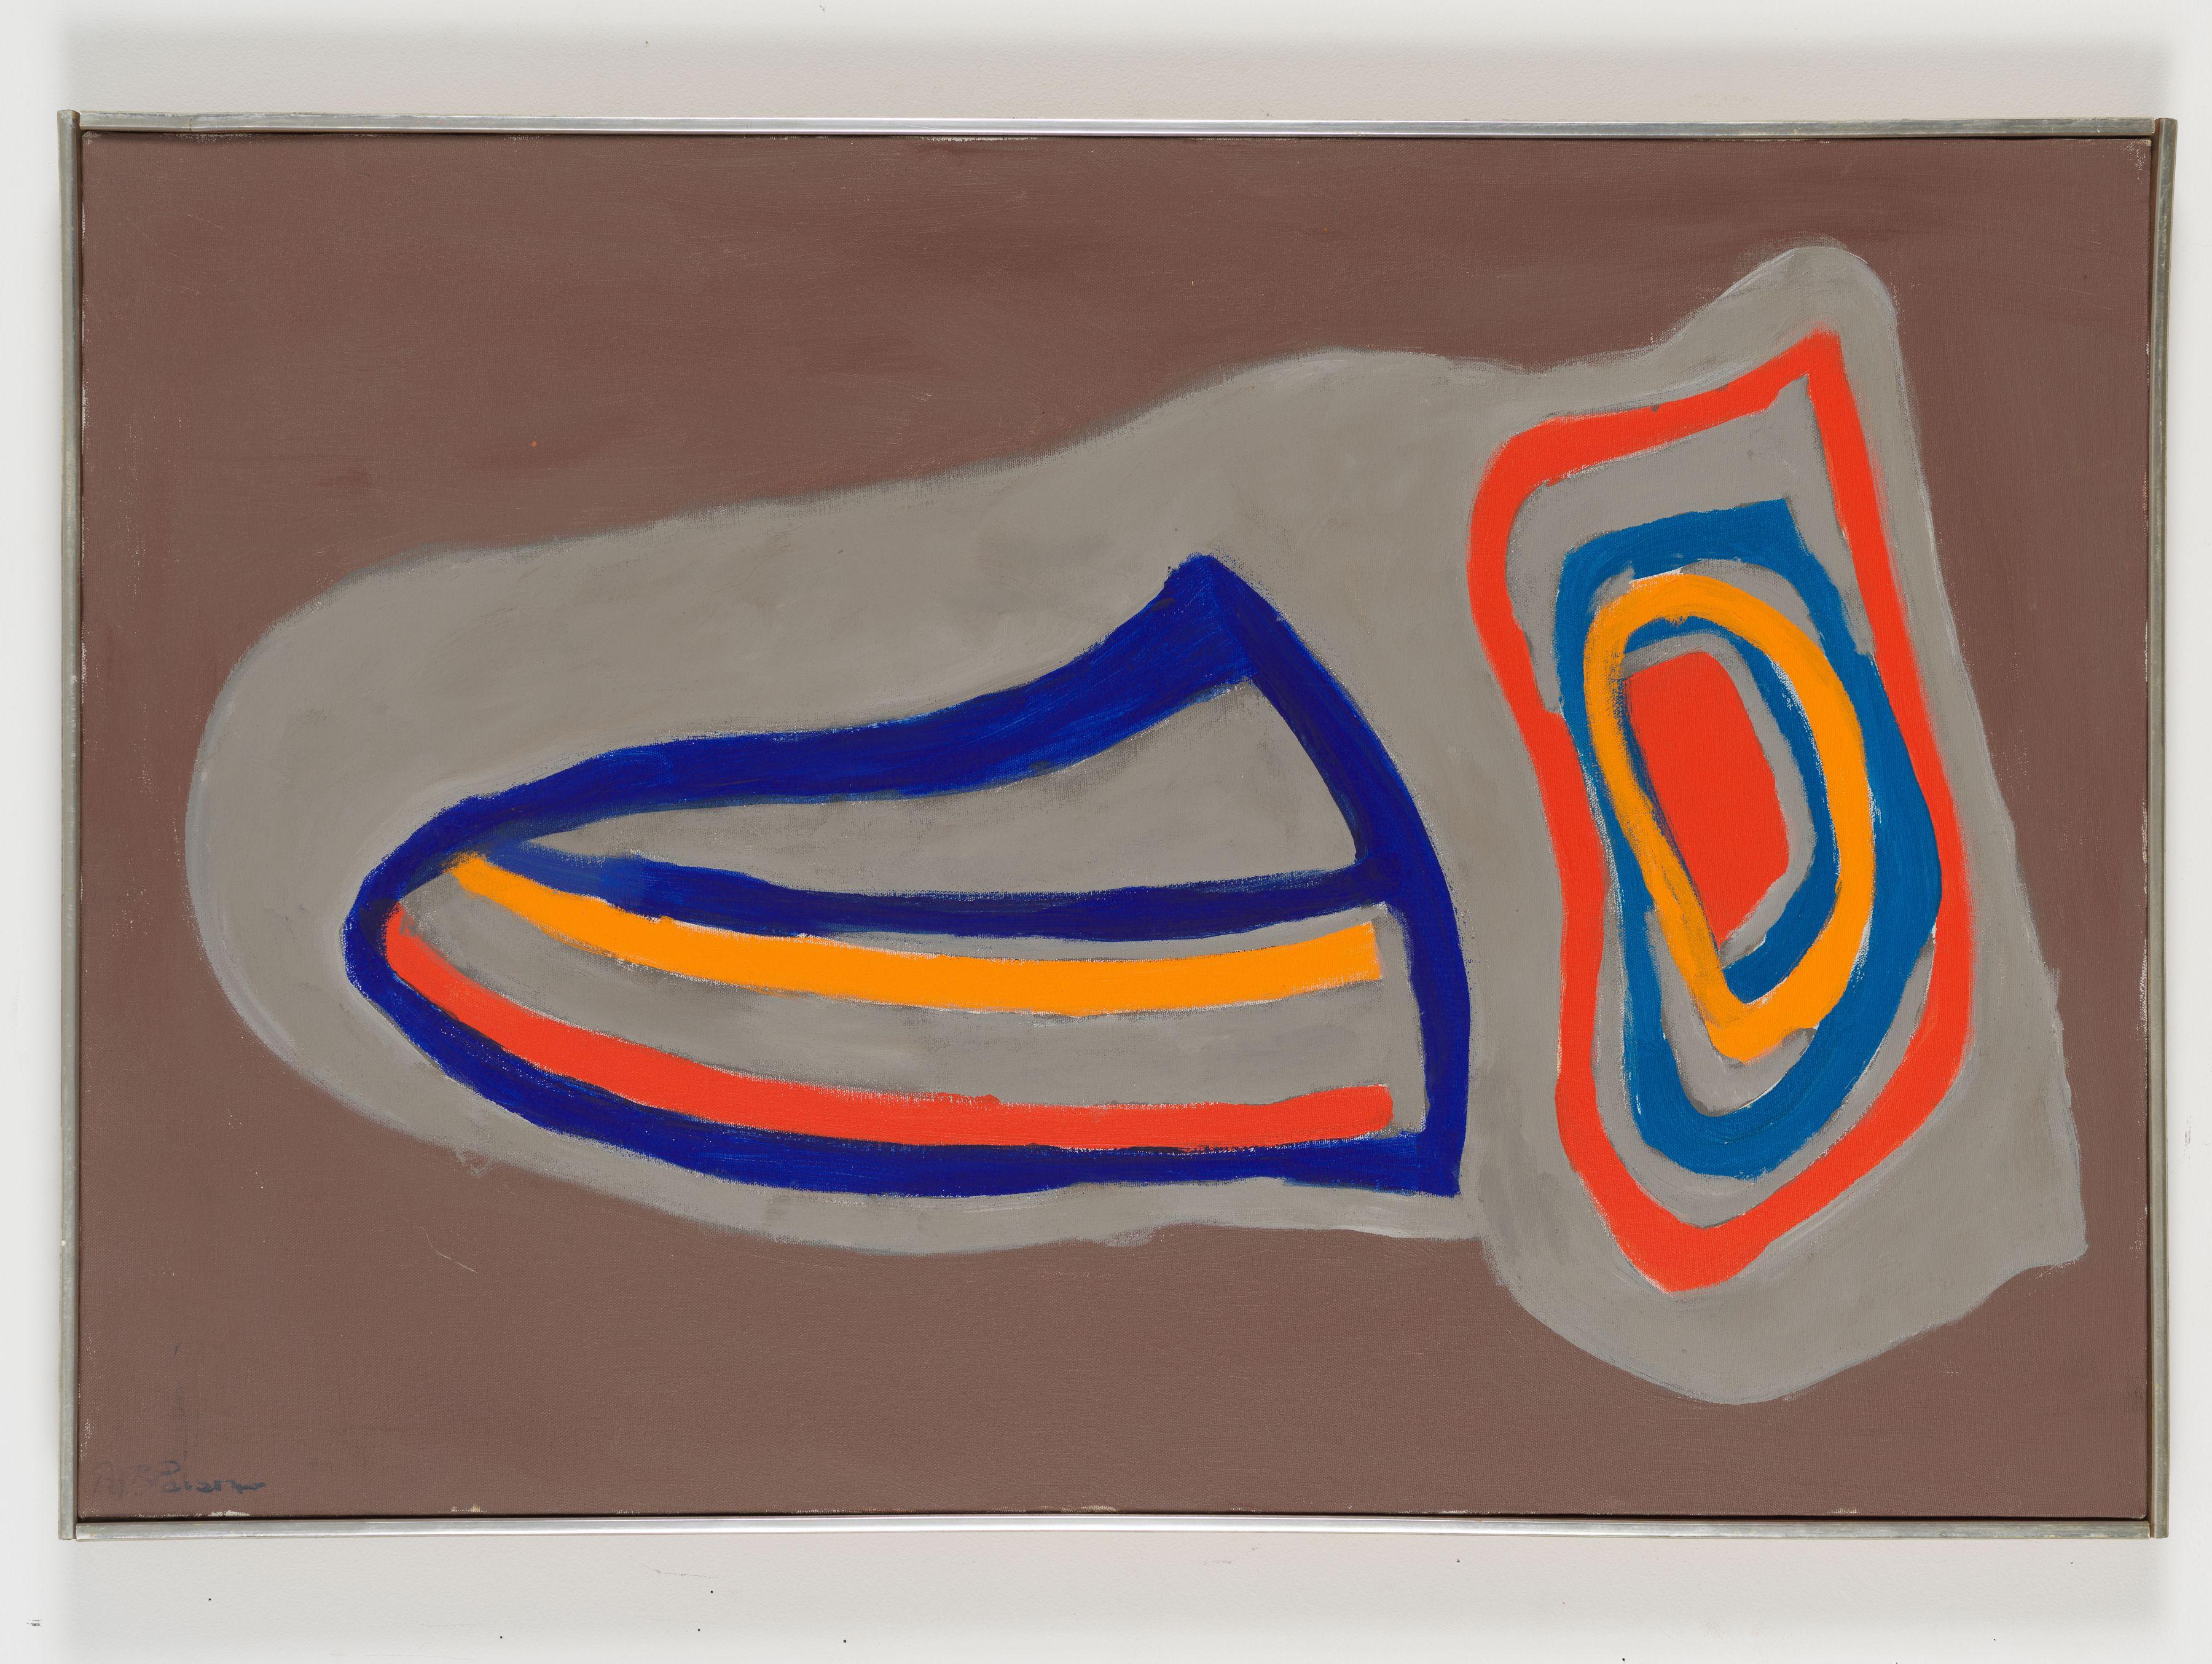 Betty Parsons, Horton's Point, 1968